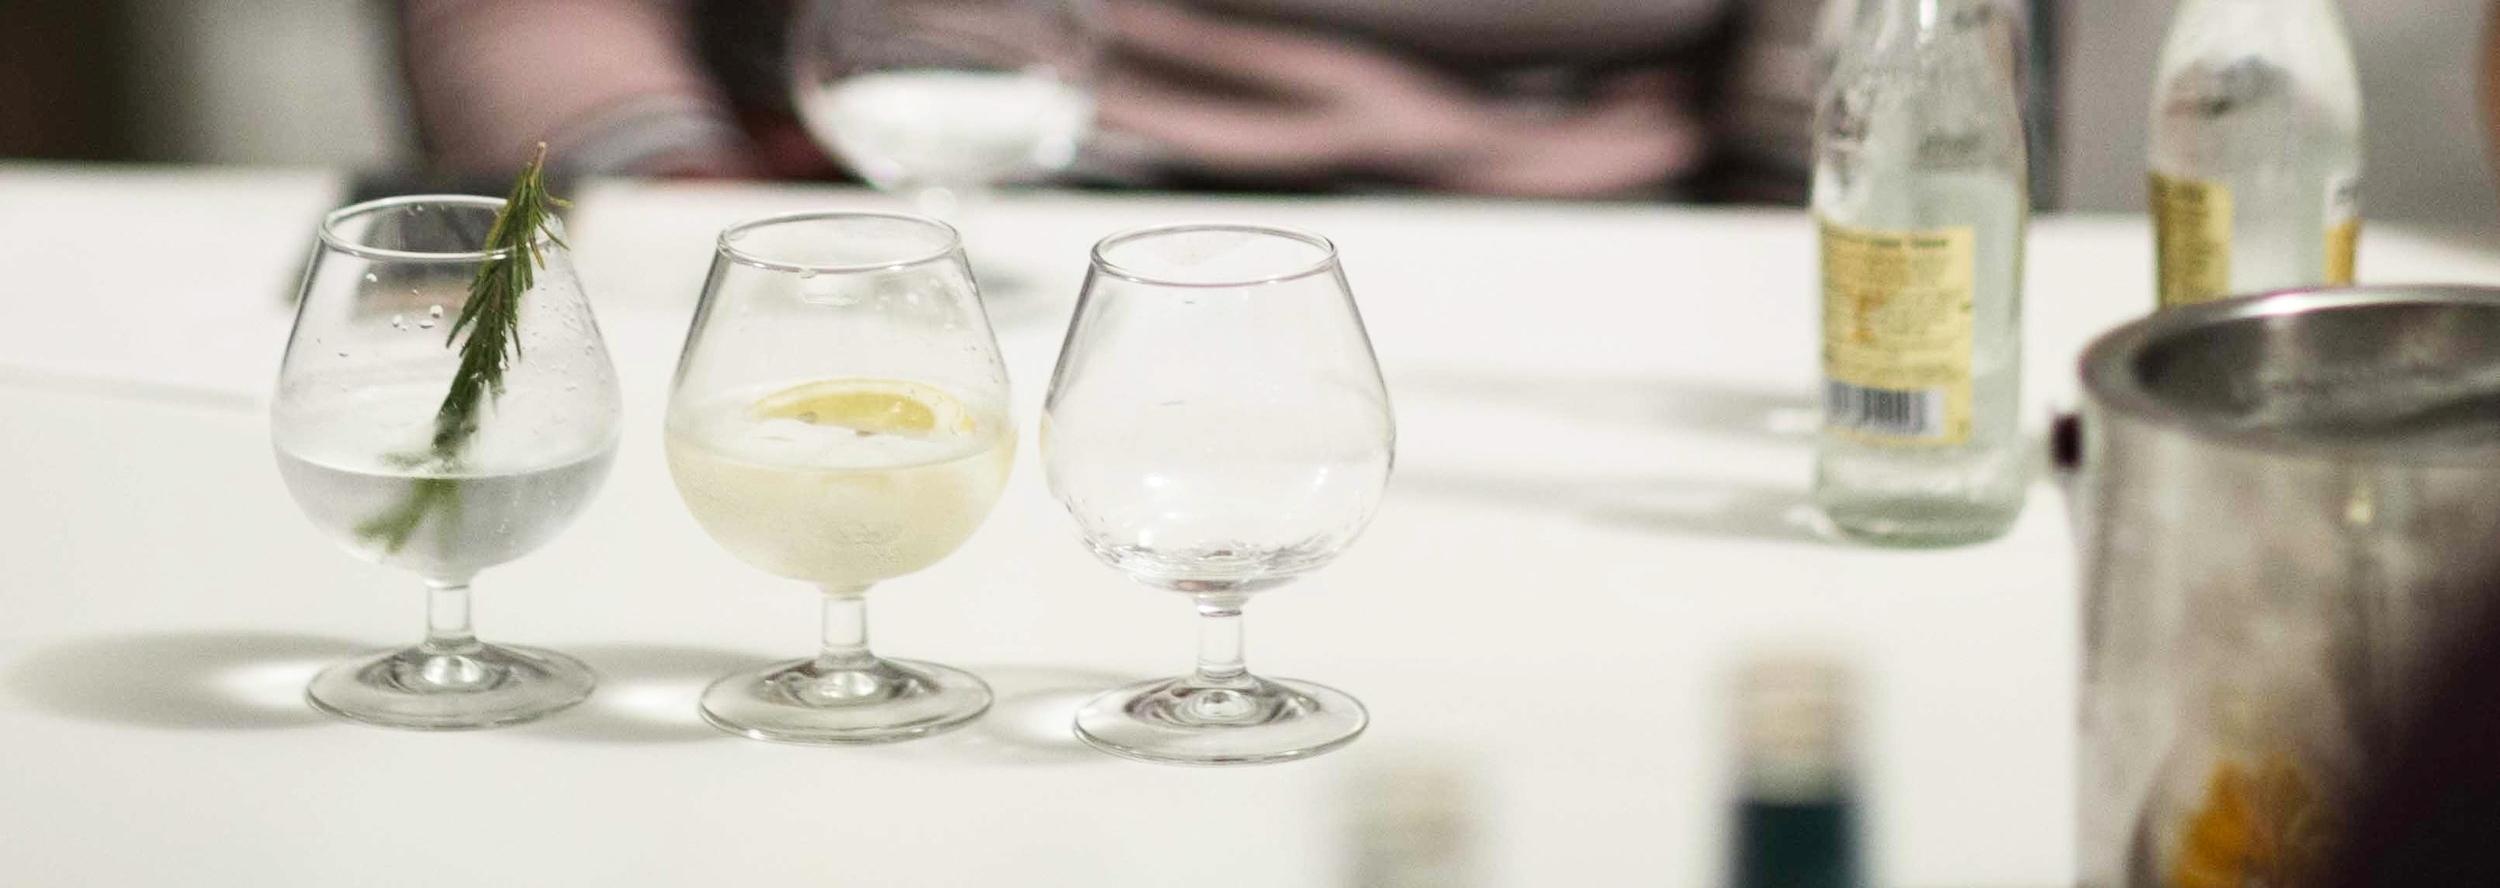 Gin Tasting 25.10.17-76.jpg